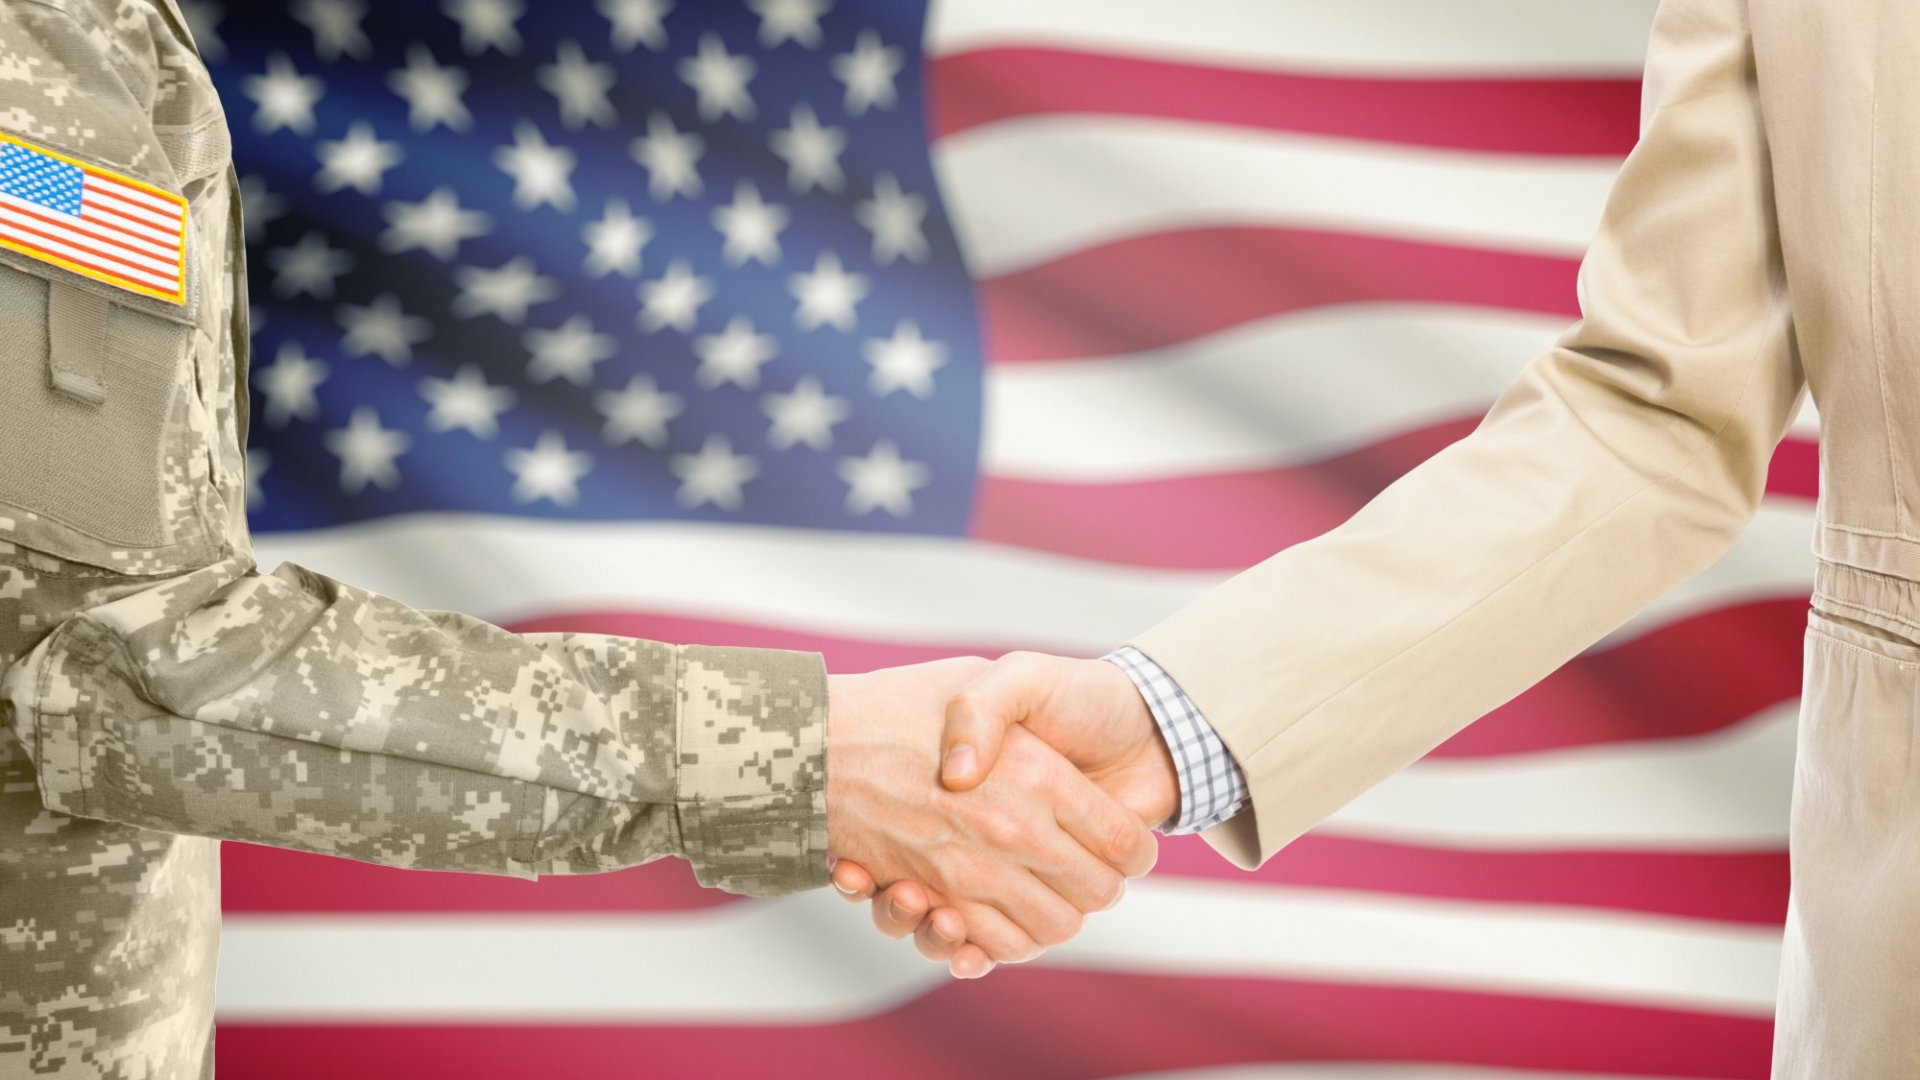 Business is a Battlefield: Veterans in the Workforce